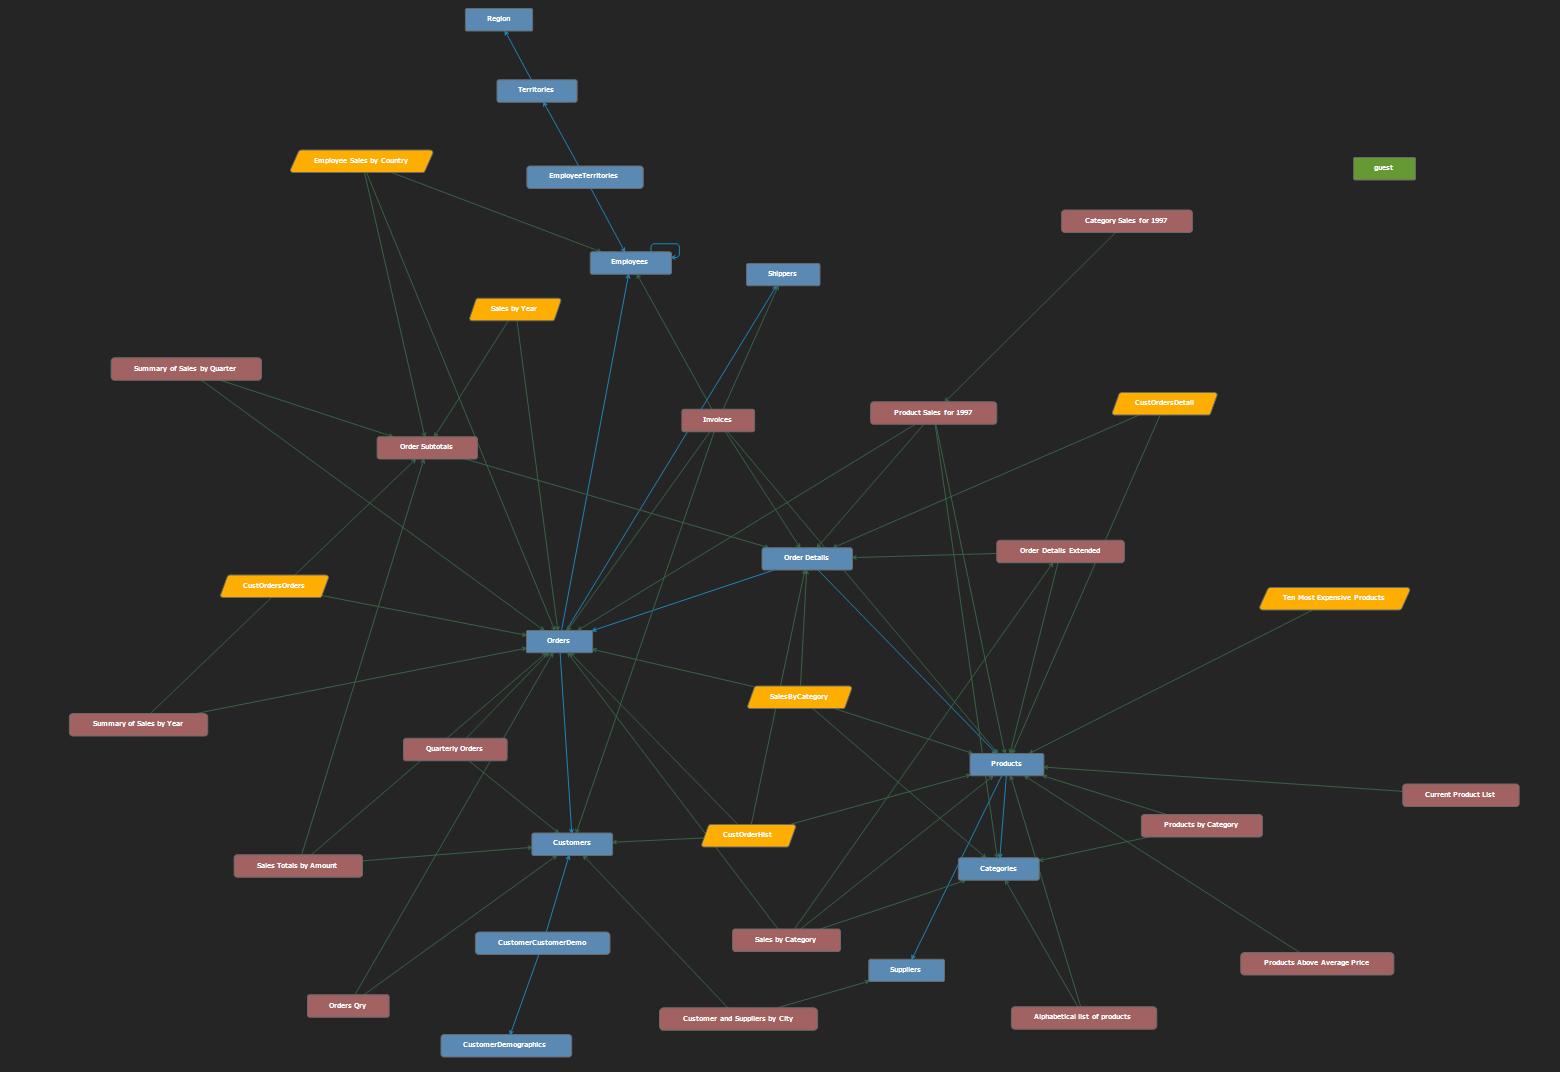 adventureworks 2012 diagram hr poster microsoft sql server historical sample database tour